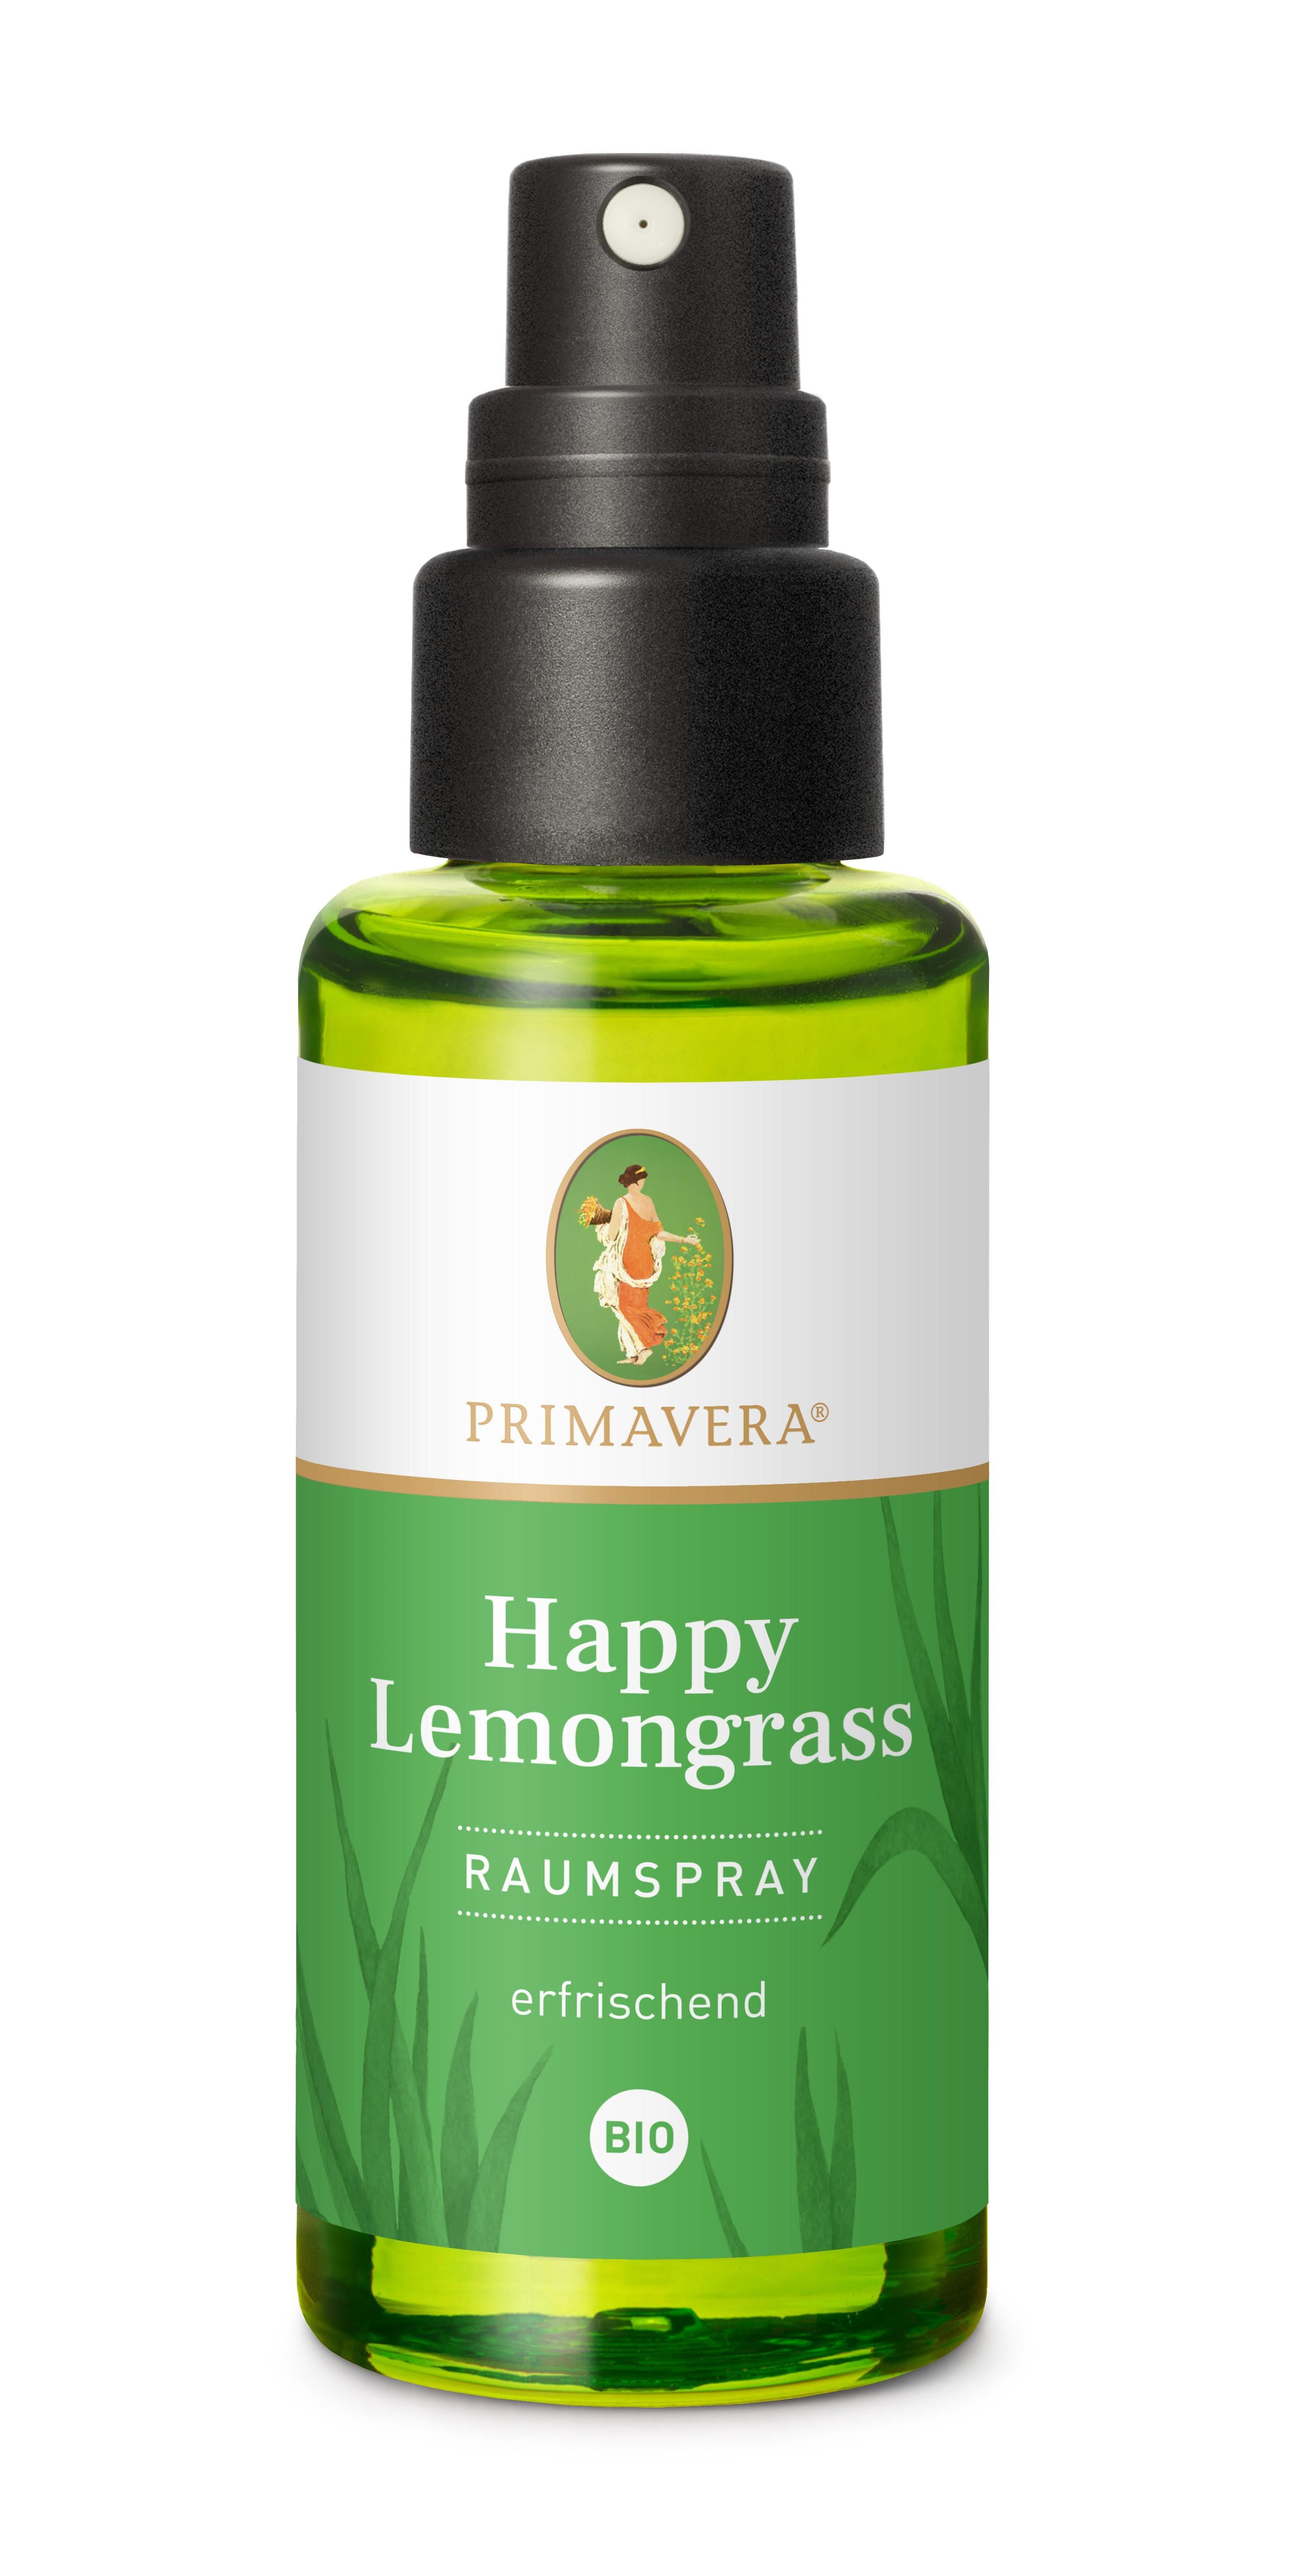 Happy Lemongrass Raumspray bio 50 ml